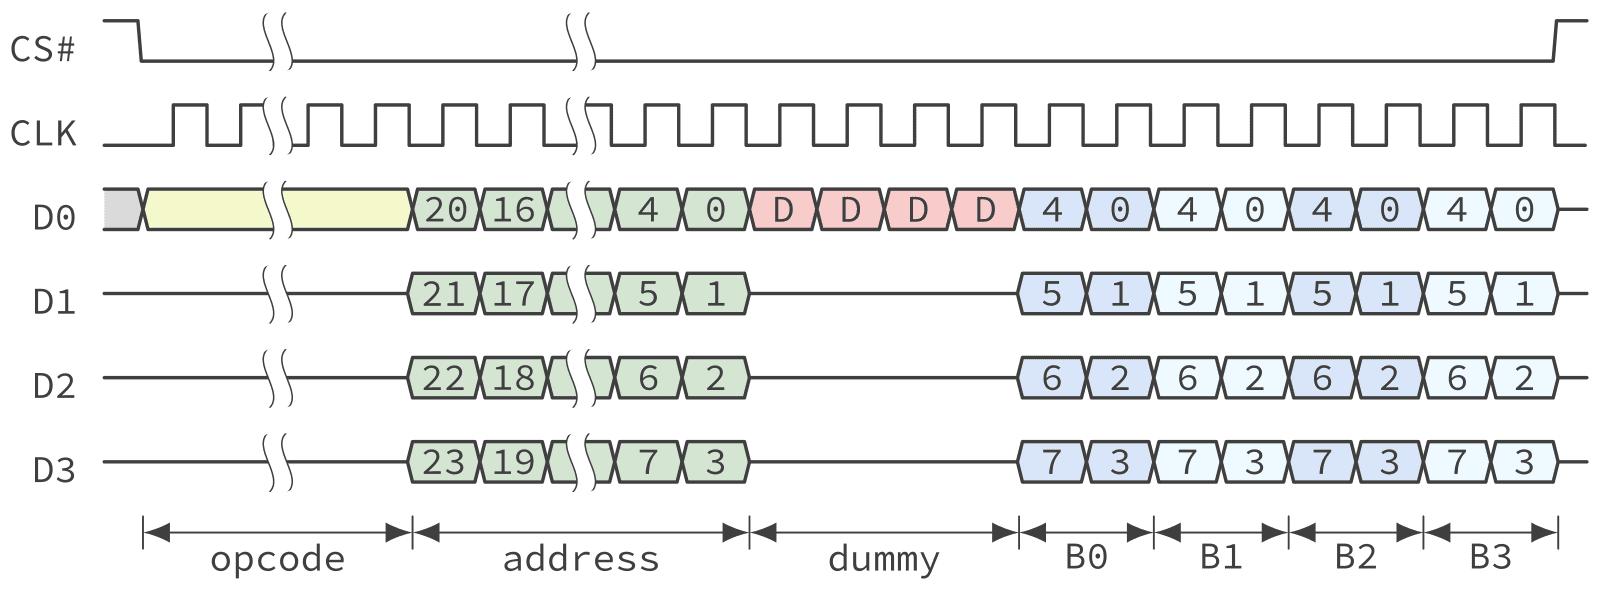 Timing diagram of a QSPI NOR Flash fast read operation in Quad I/O mode.